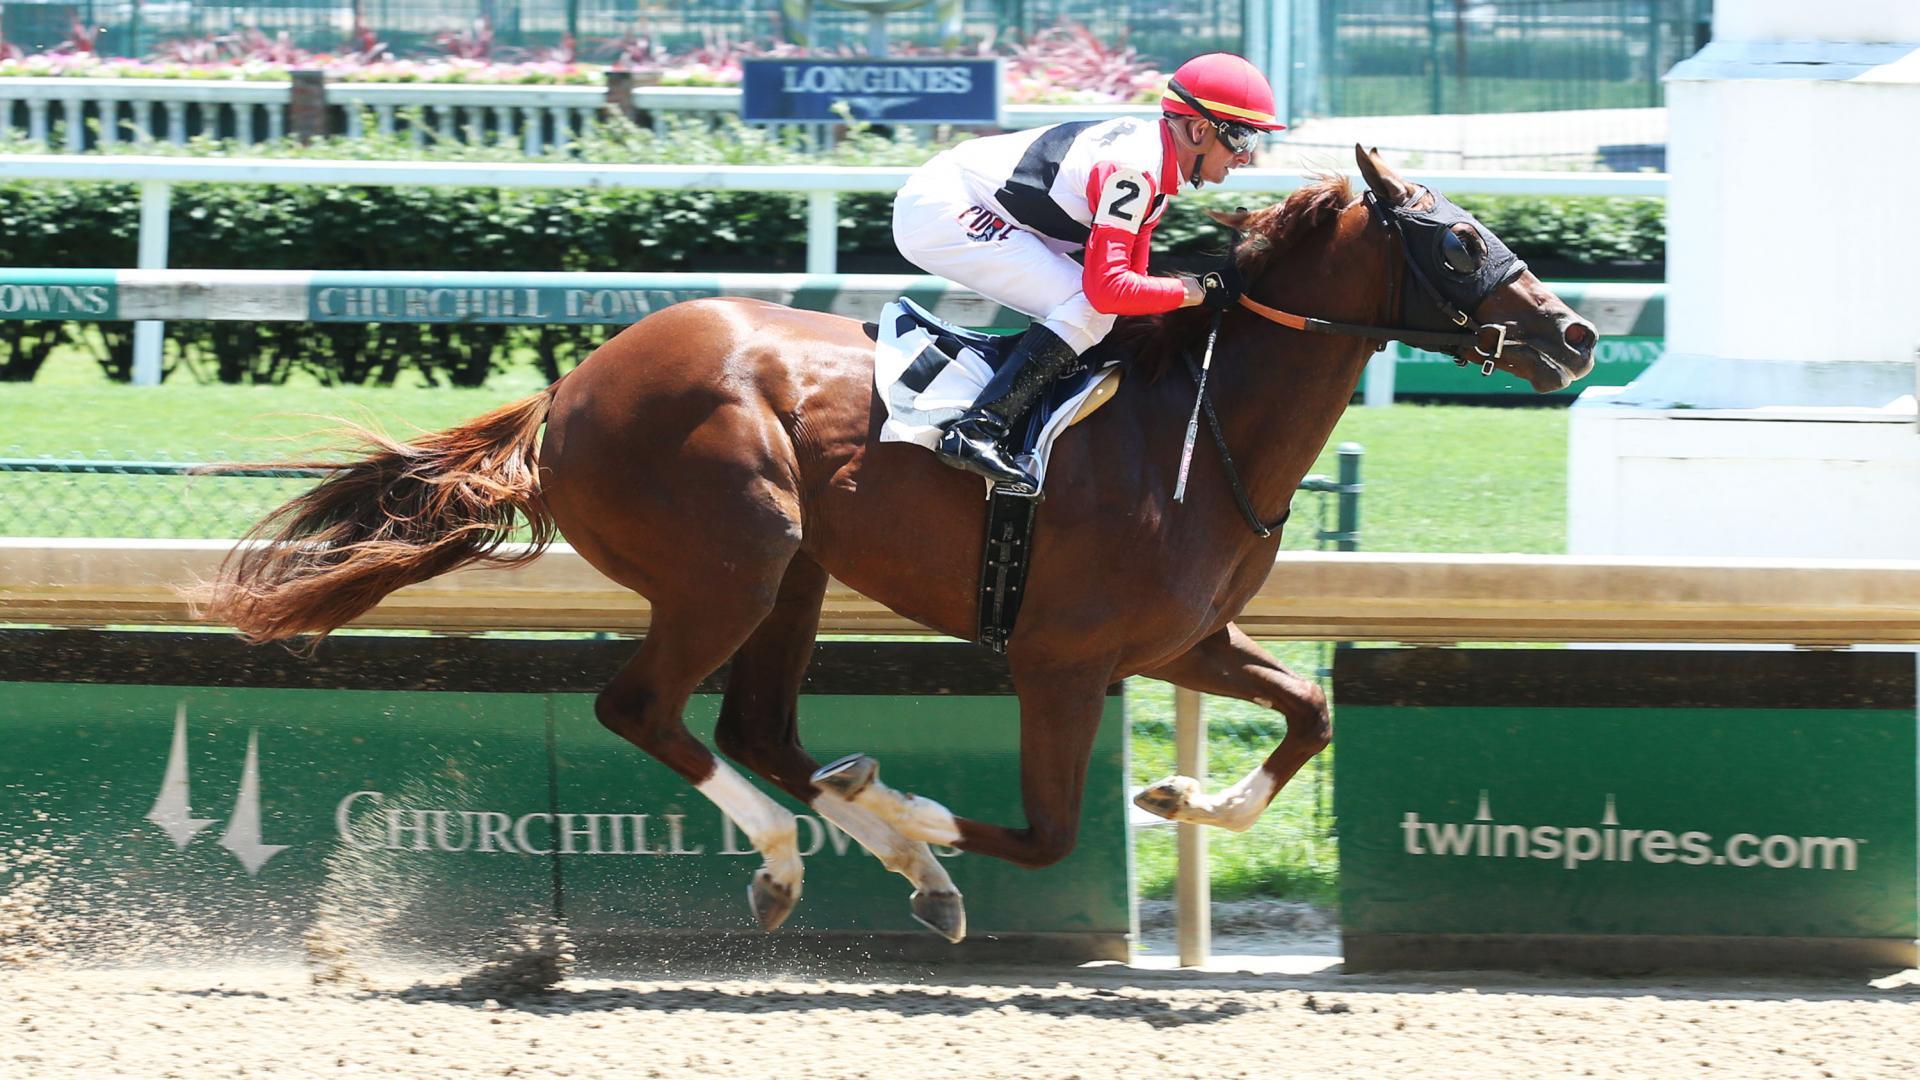 Scabbard race horse